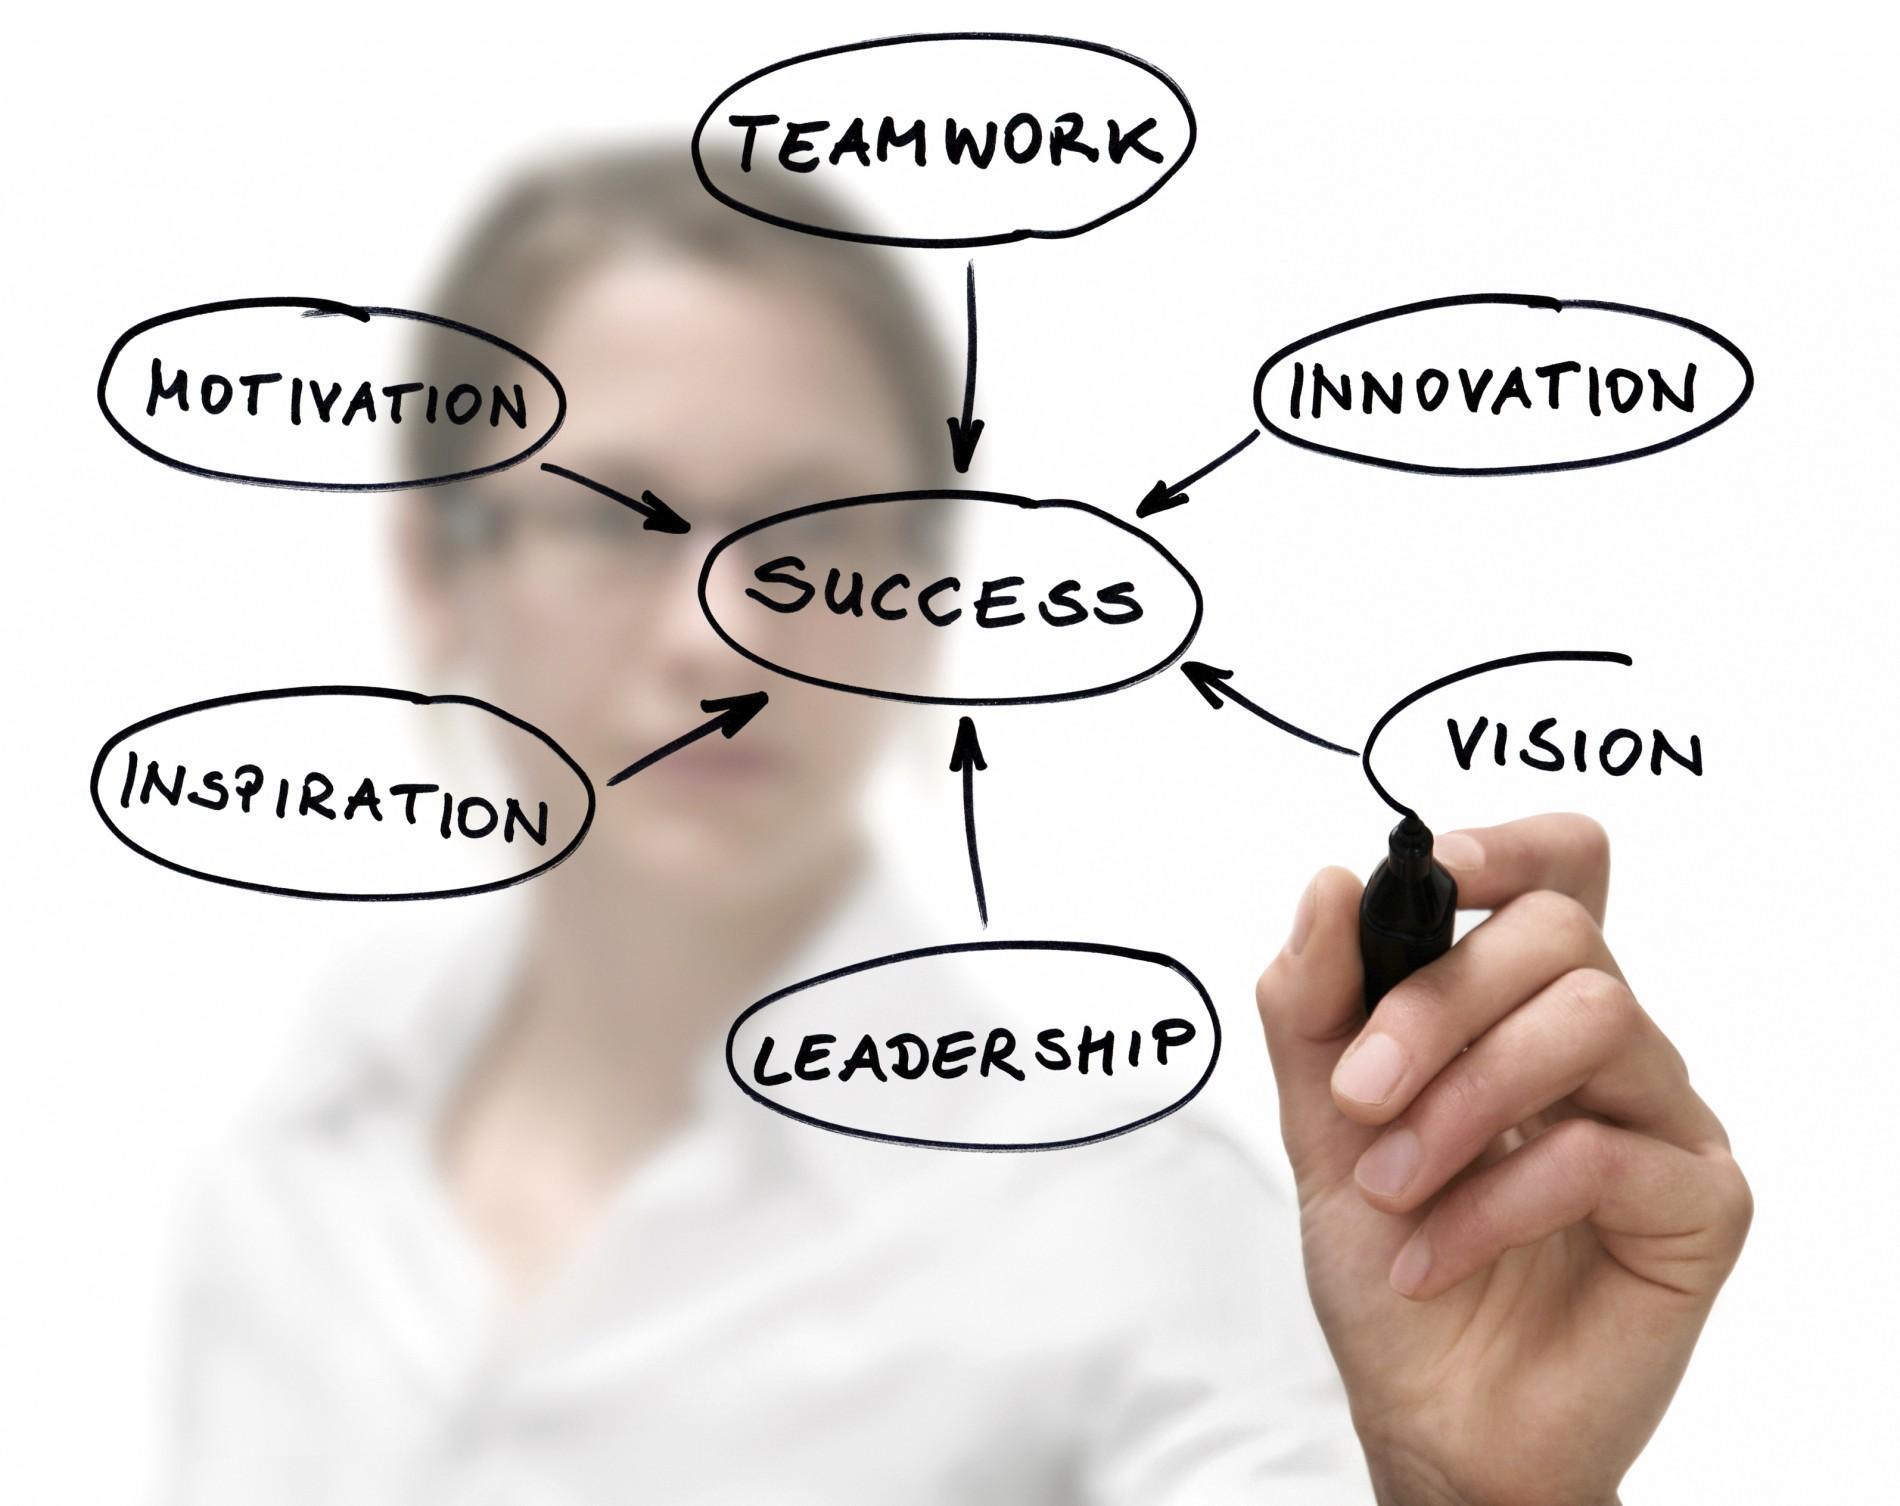 LeadershipChart